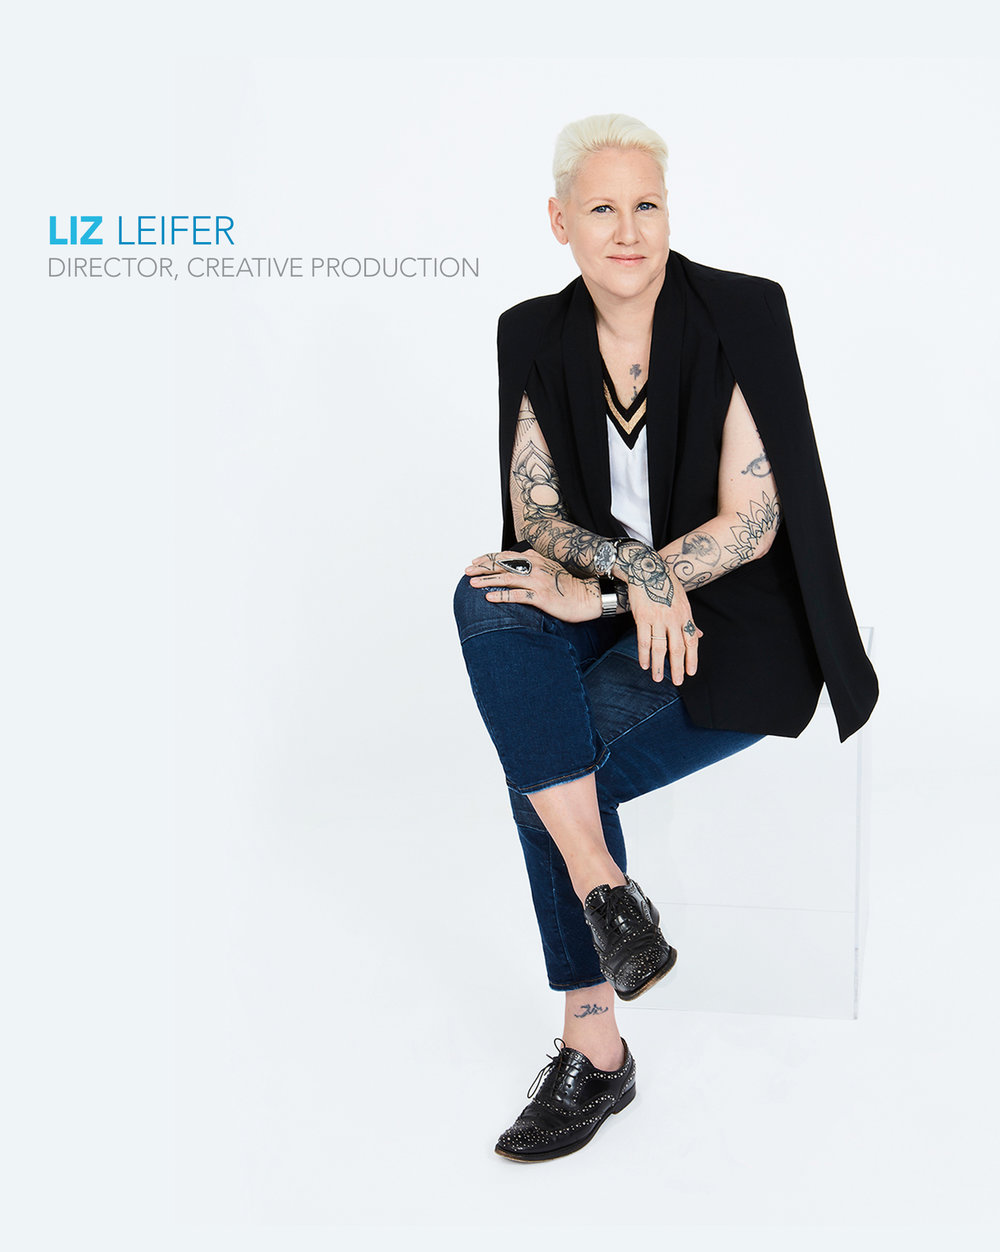 Liz Leifer